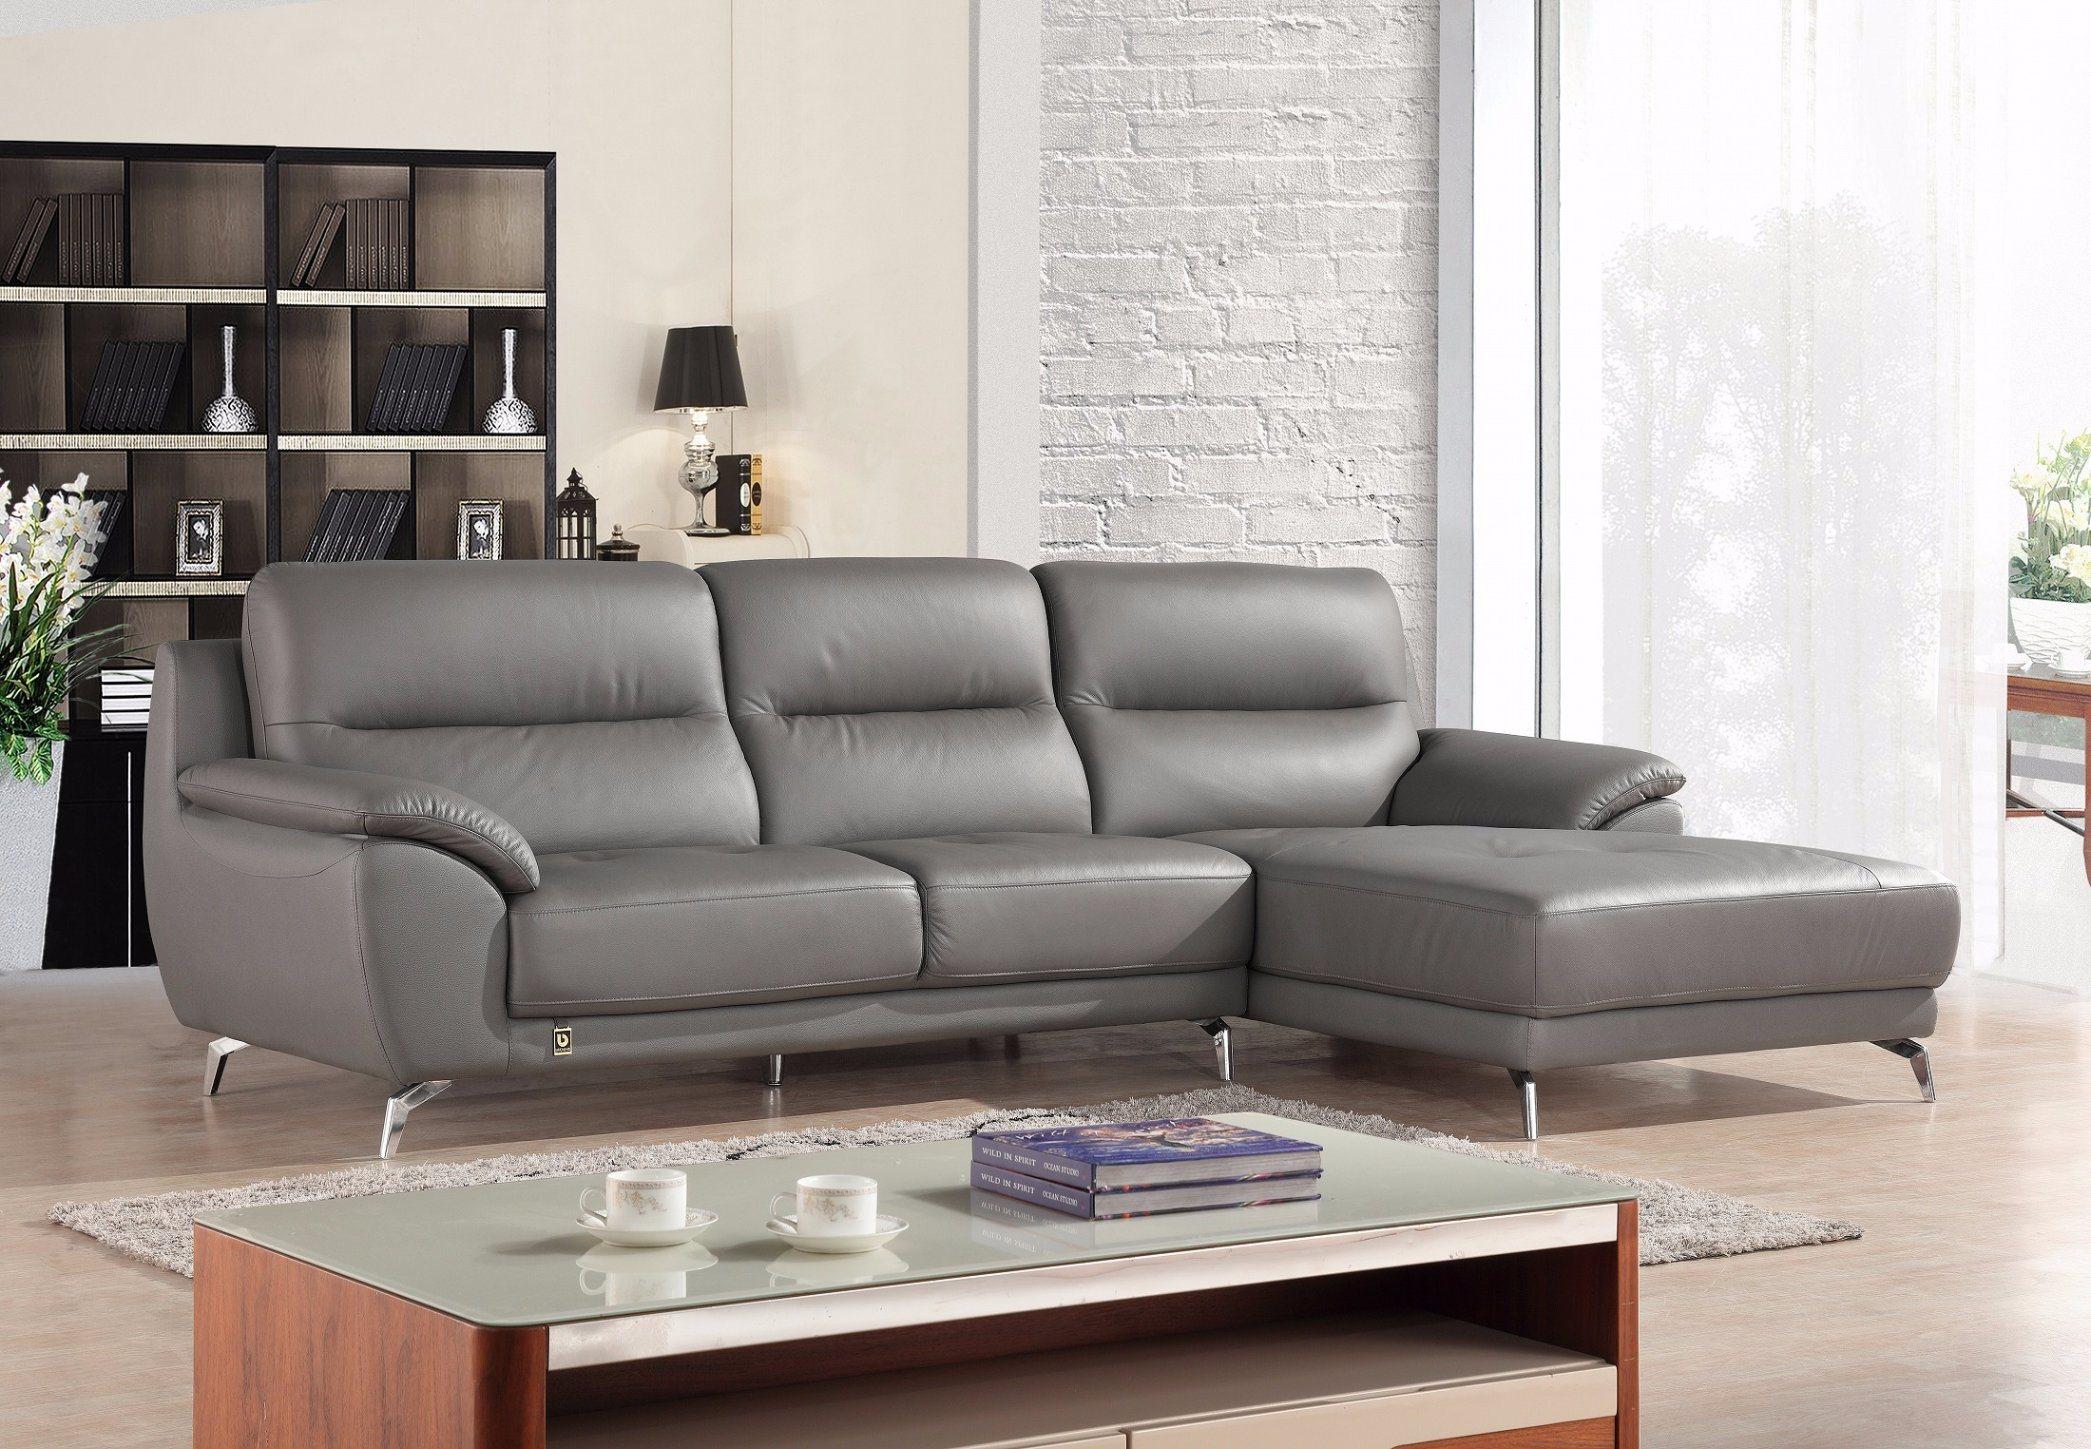 China European Modern L Shape Sectional Leather Sofa Sbl 1715